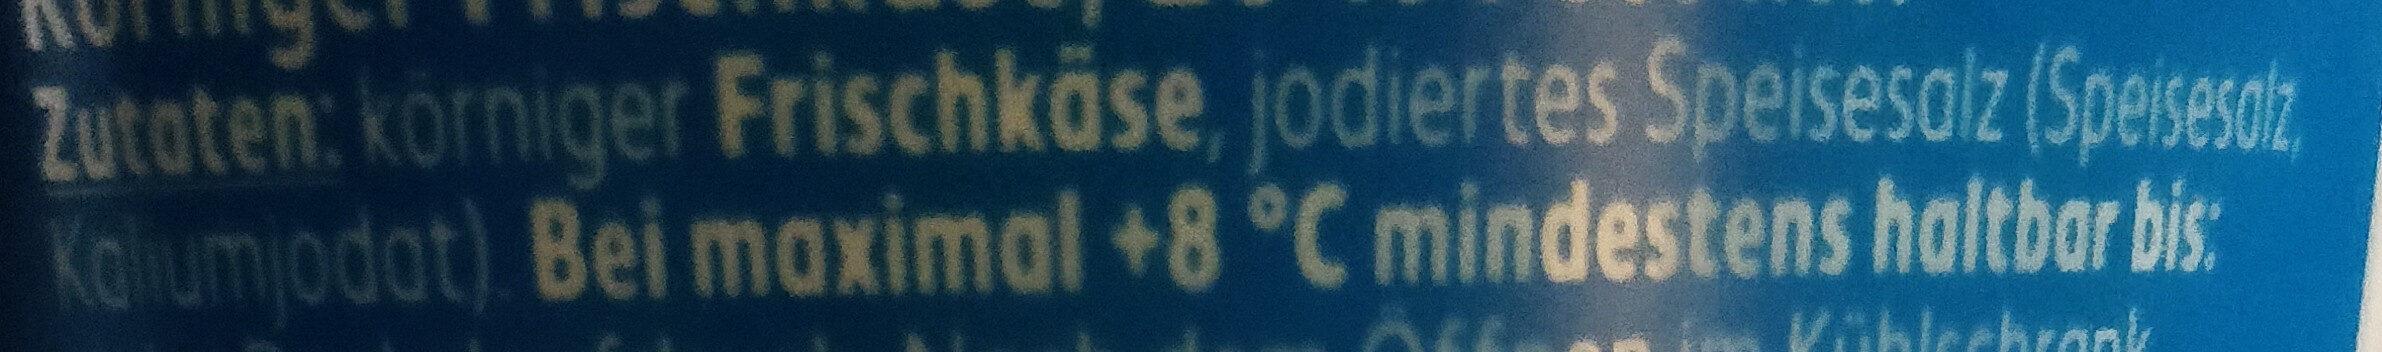 Körniger Frischkäse - Ingrédients - de